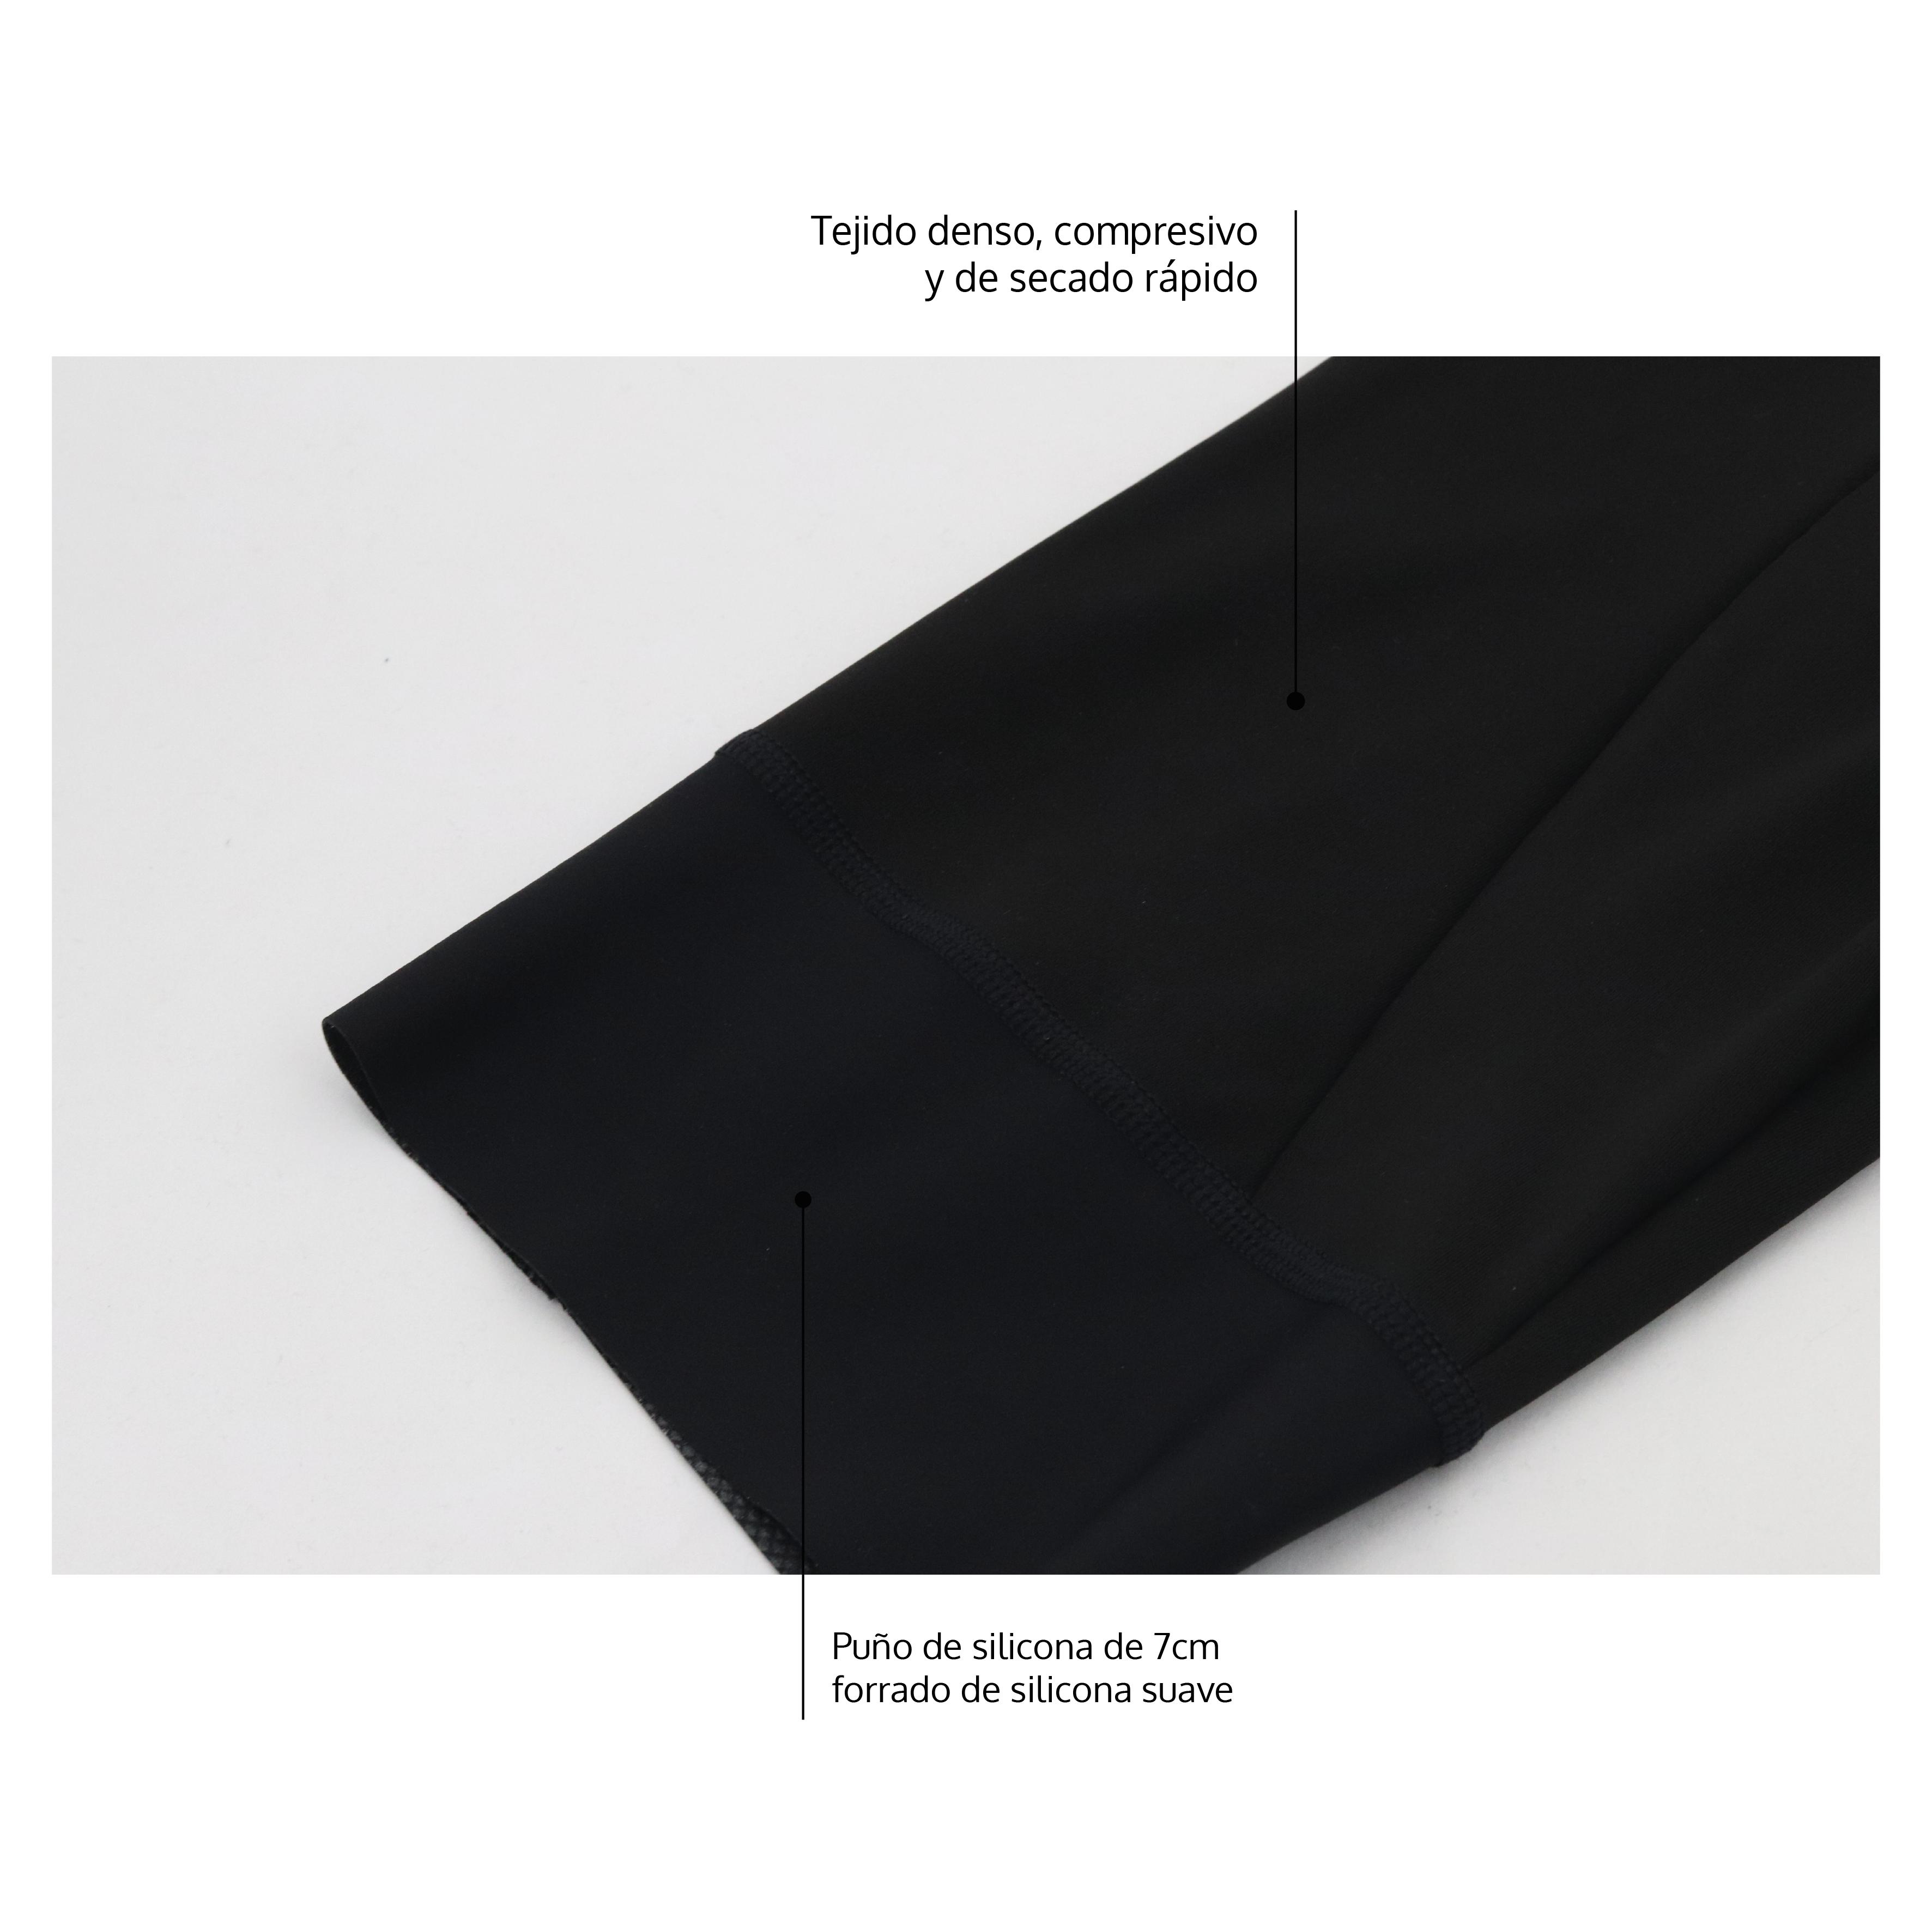 culotte negro one detalle